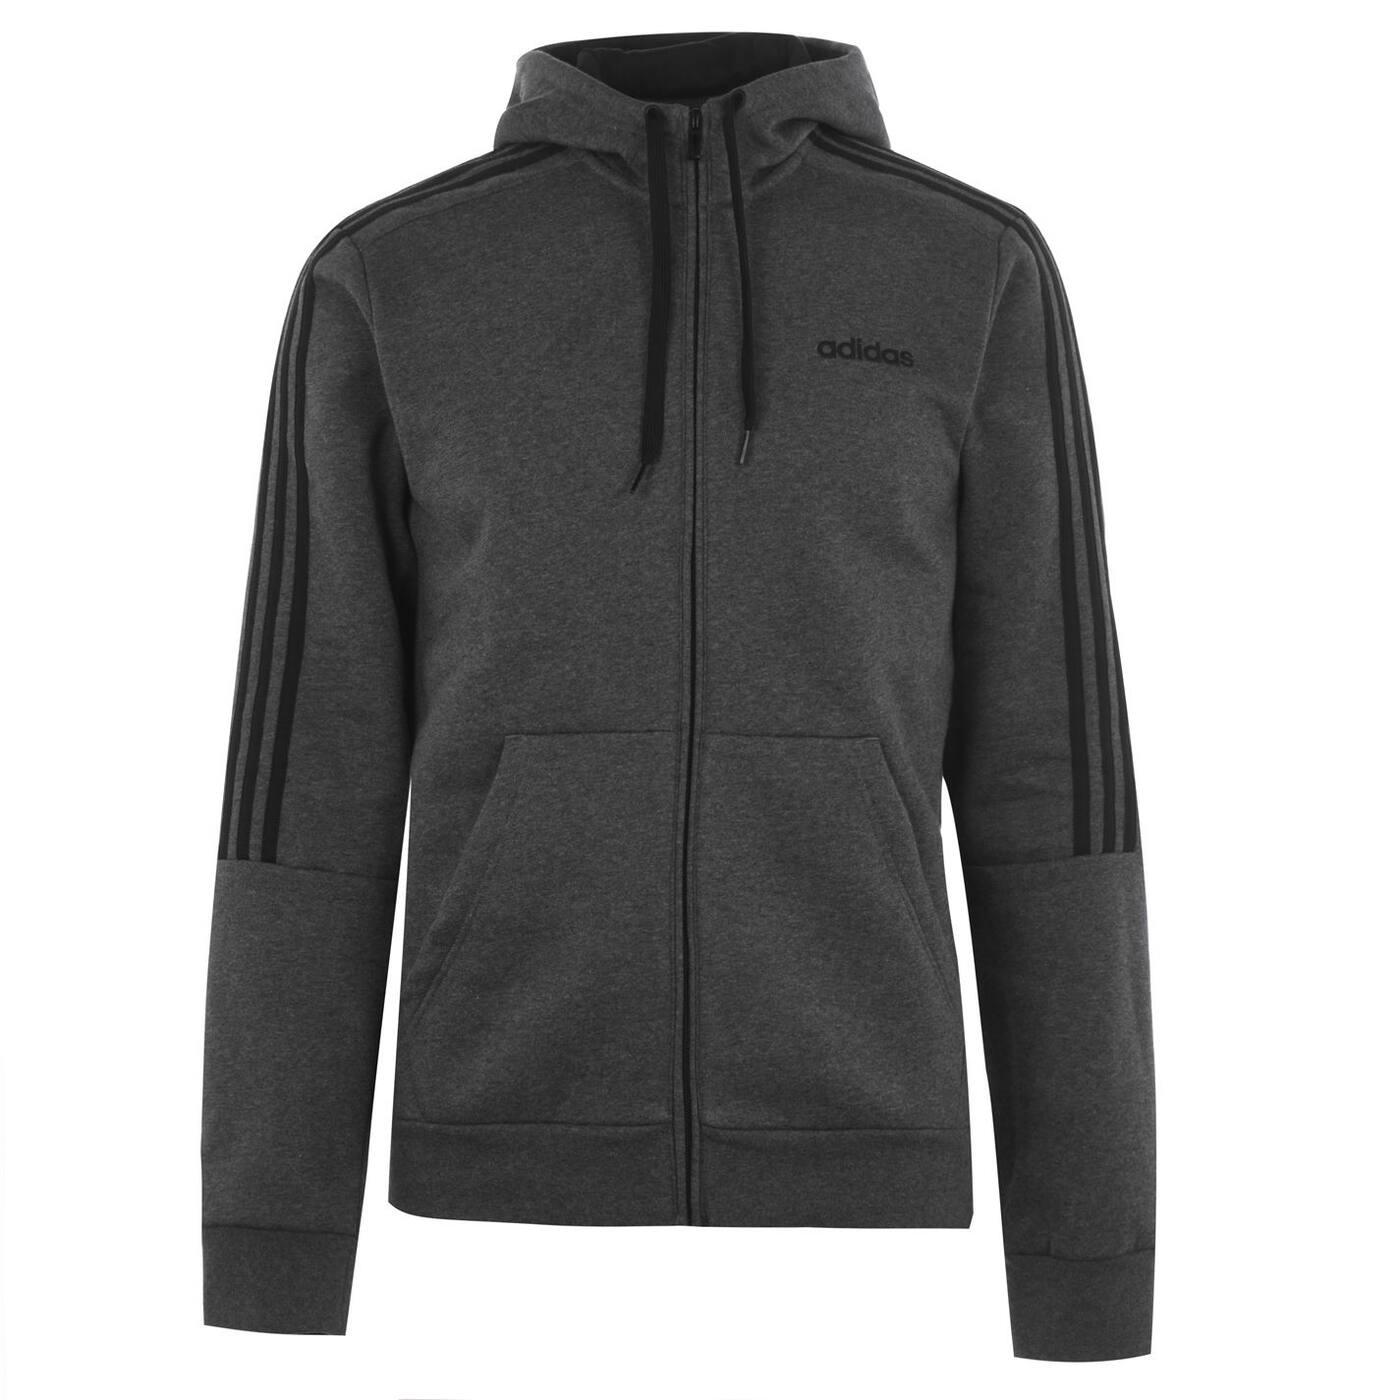 Men's hoodie Adidas 3 Stripe Zipped